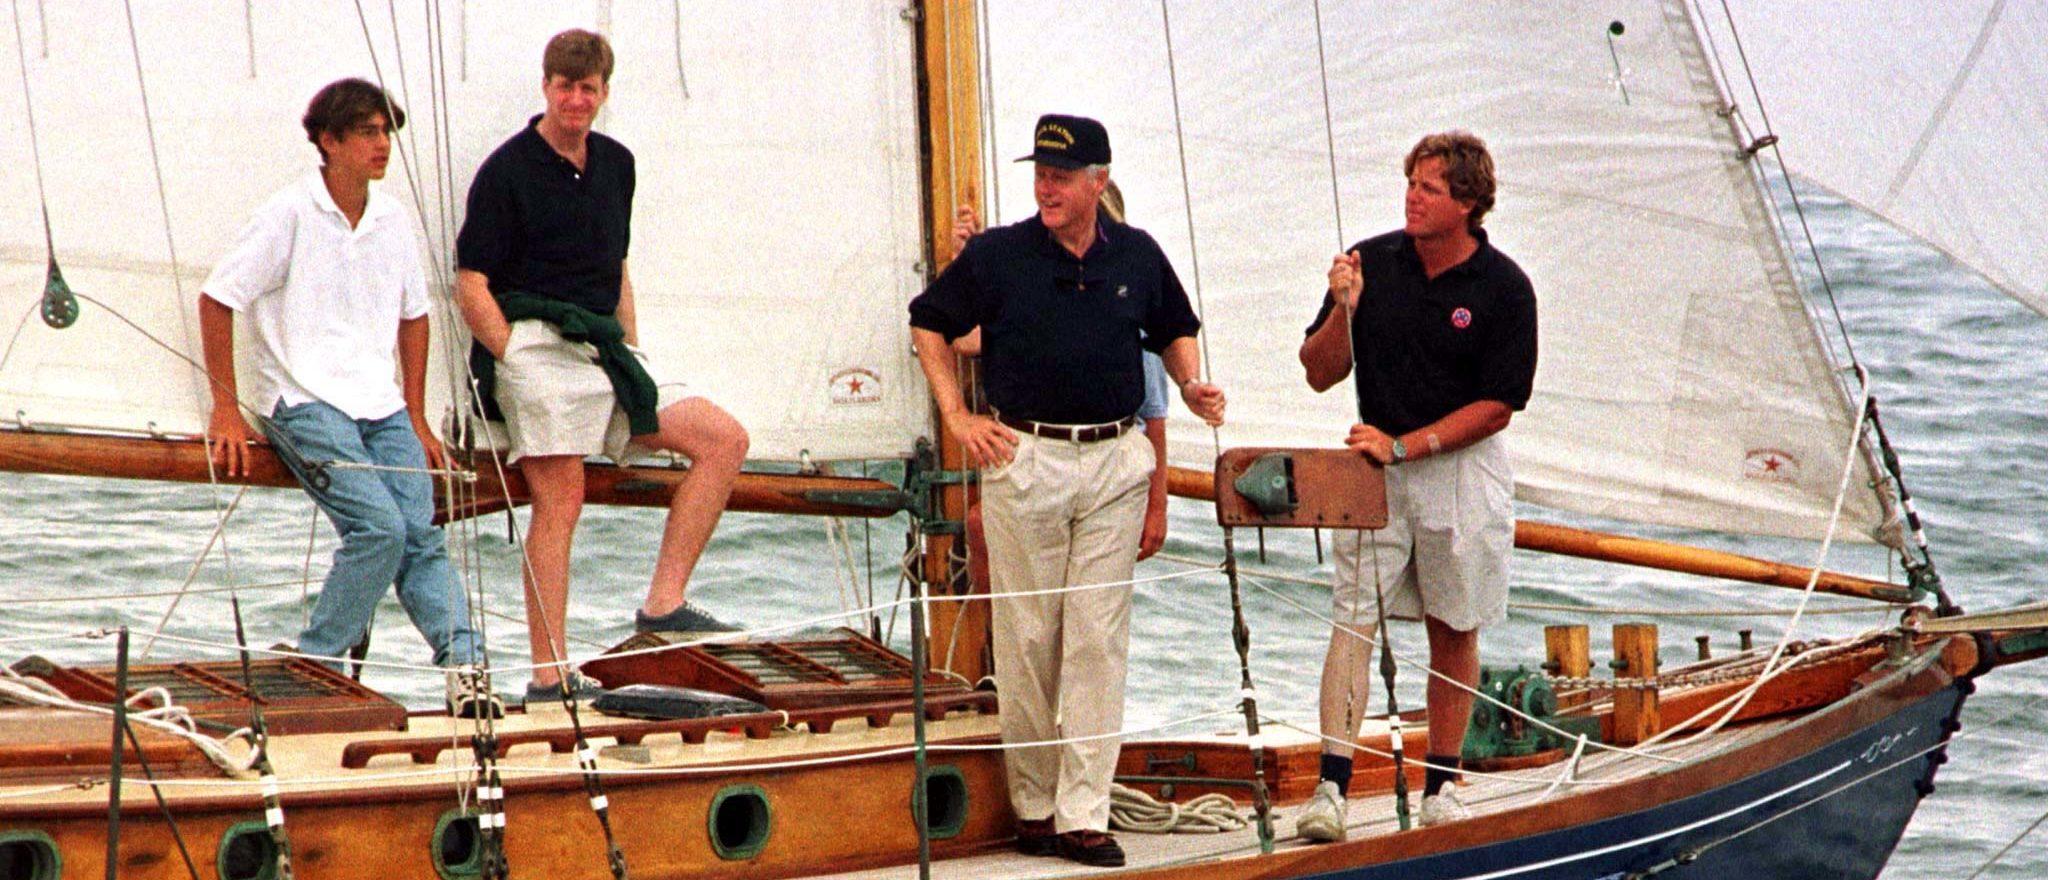 Bill Clinton: Martha's Vineyard in summer (Reuters)